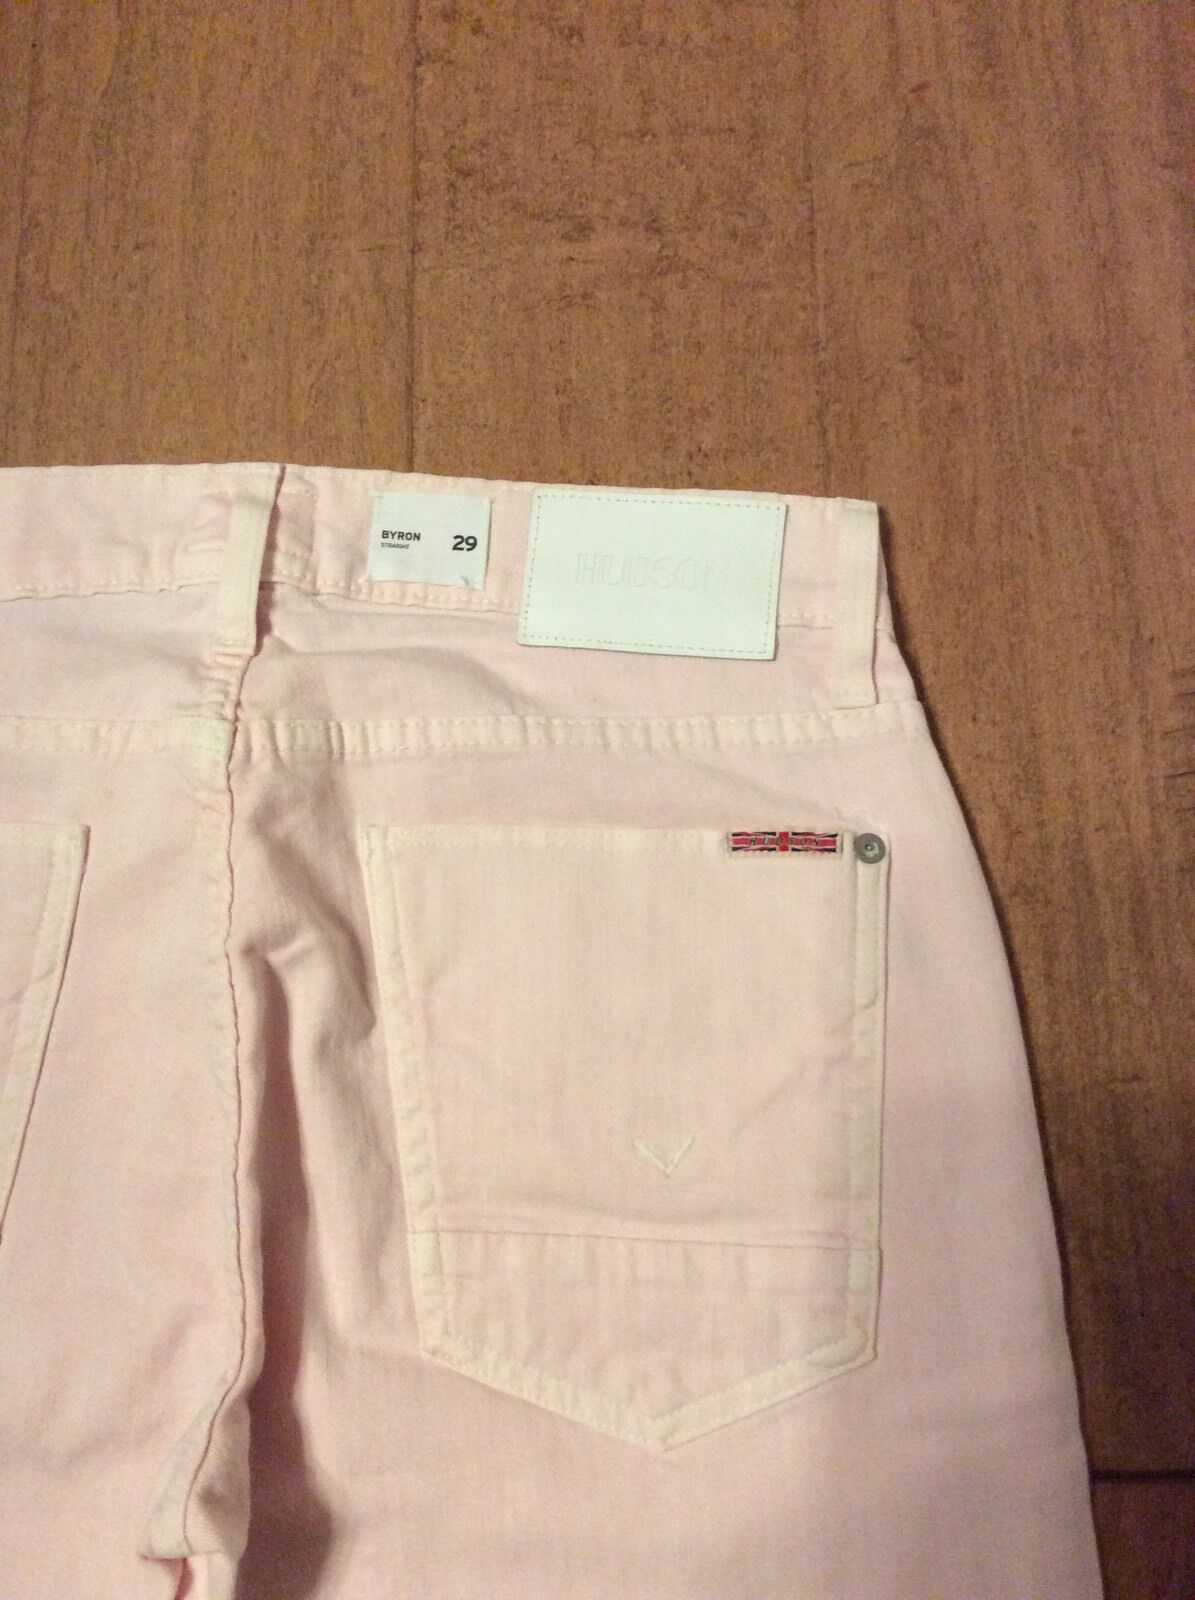 HUDSON Byron Straight Leg Ladies Lightweight Jeans Light Pink Size 29 NWT